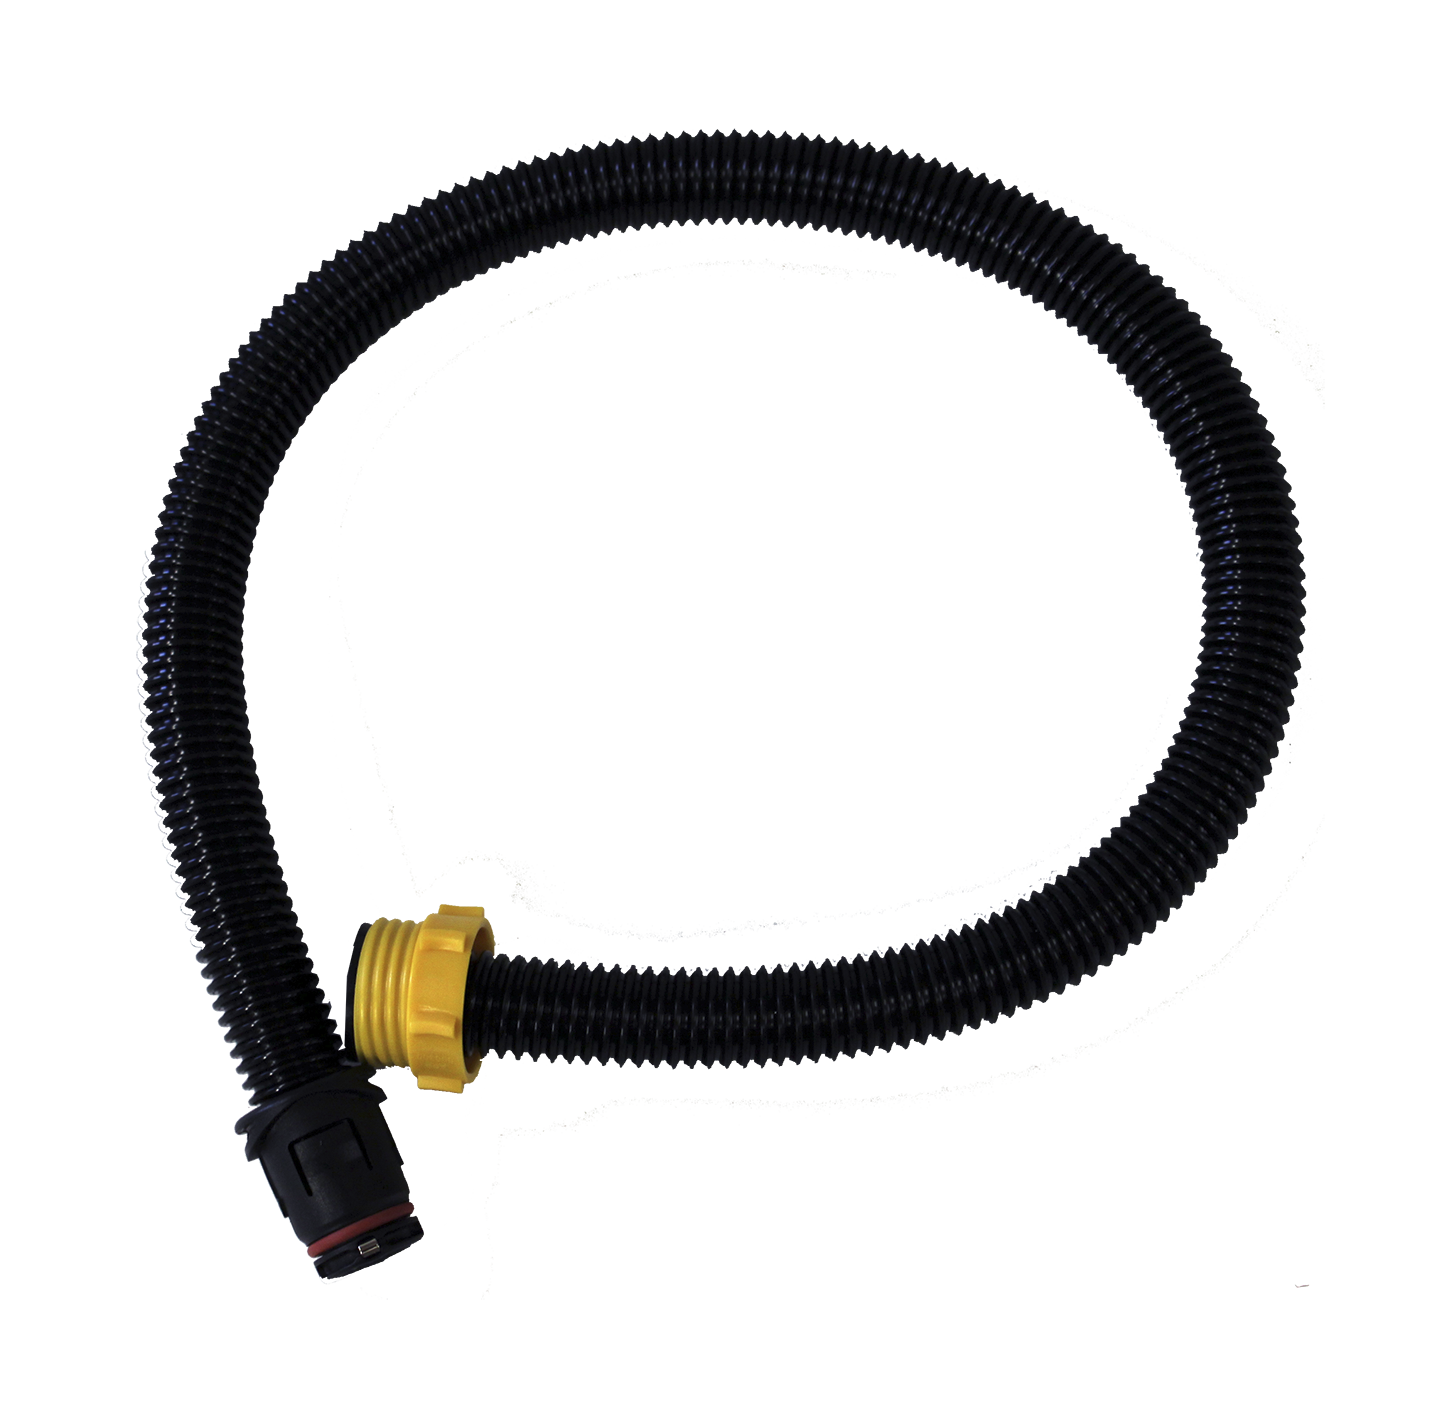 Honeywell Slange HSP med adapter + DIN